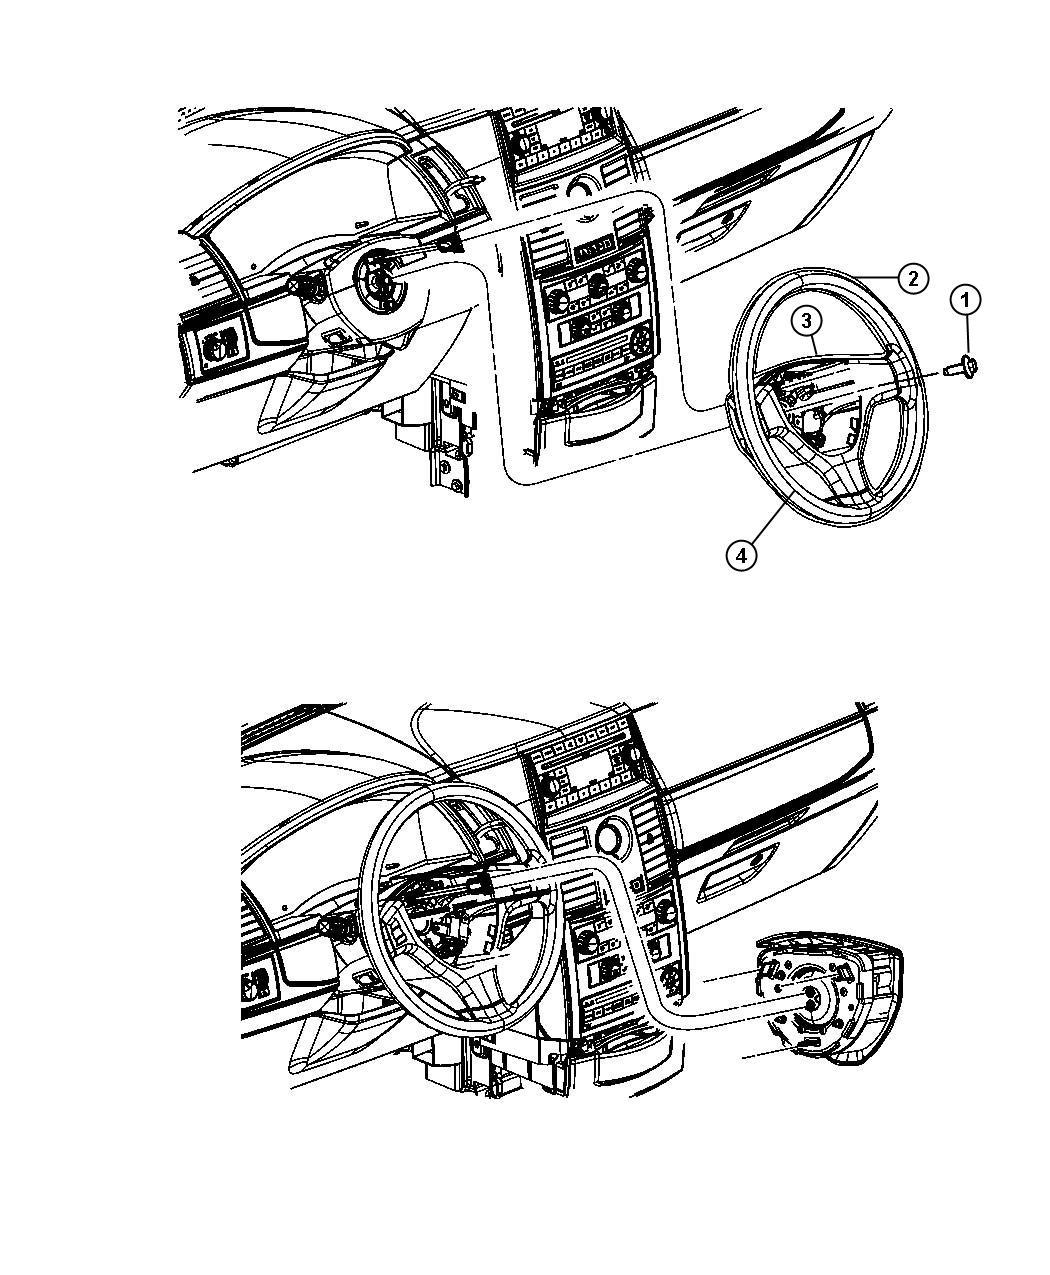 2010 dodge grand caravan wheel  steering   ks  scl    t1